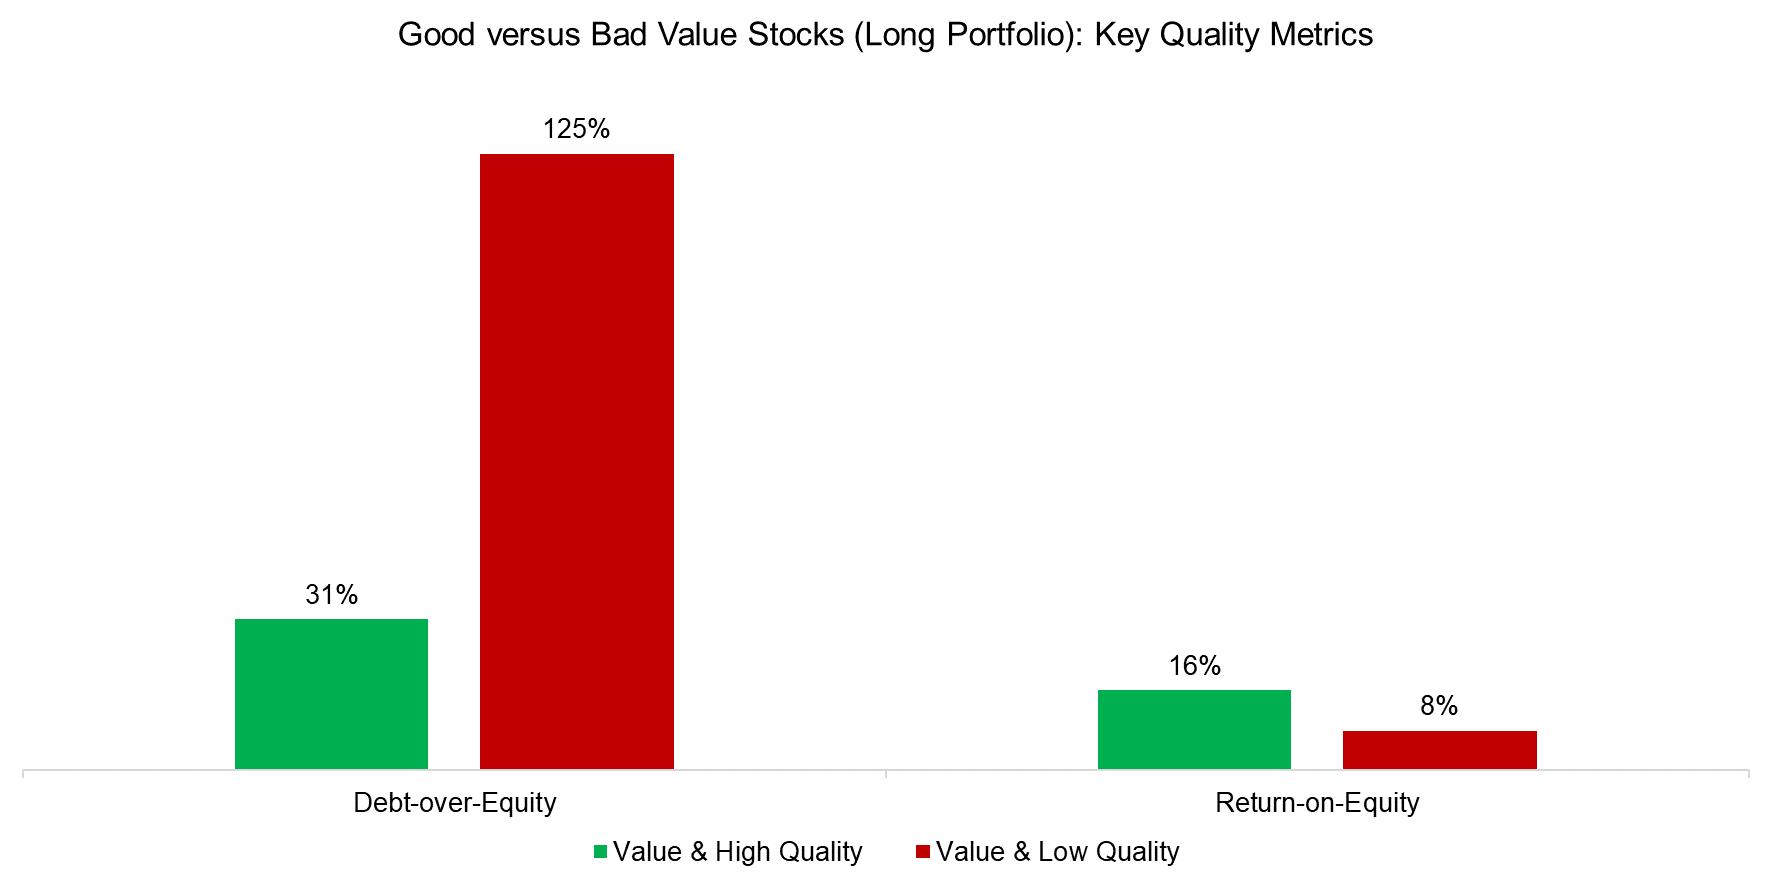 Good versus Bad Value Stocks (Long Portfolio) Key Quality Metrics